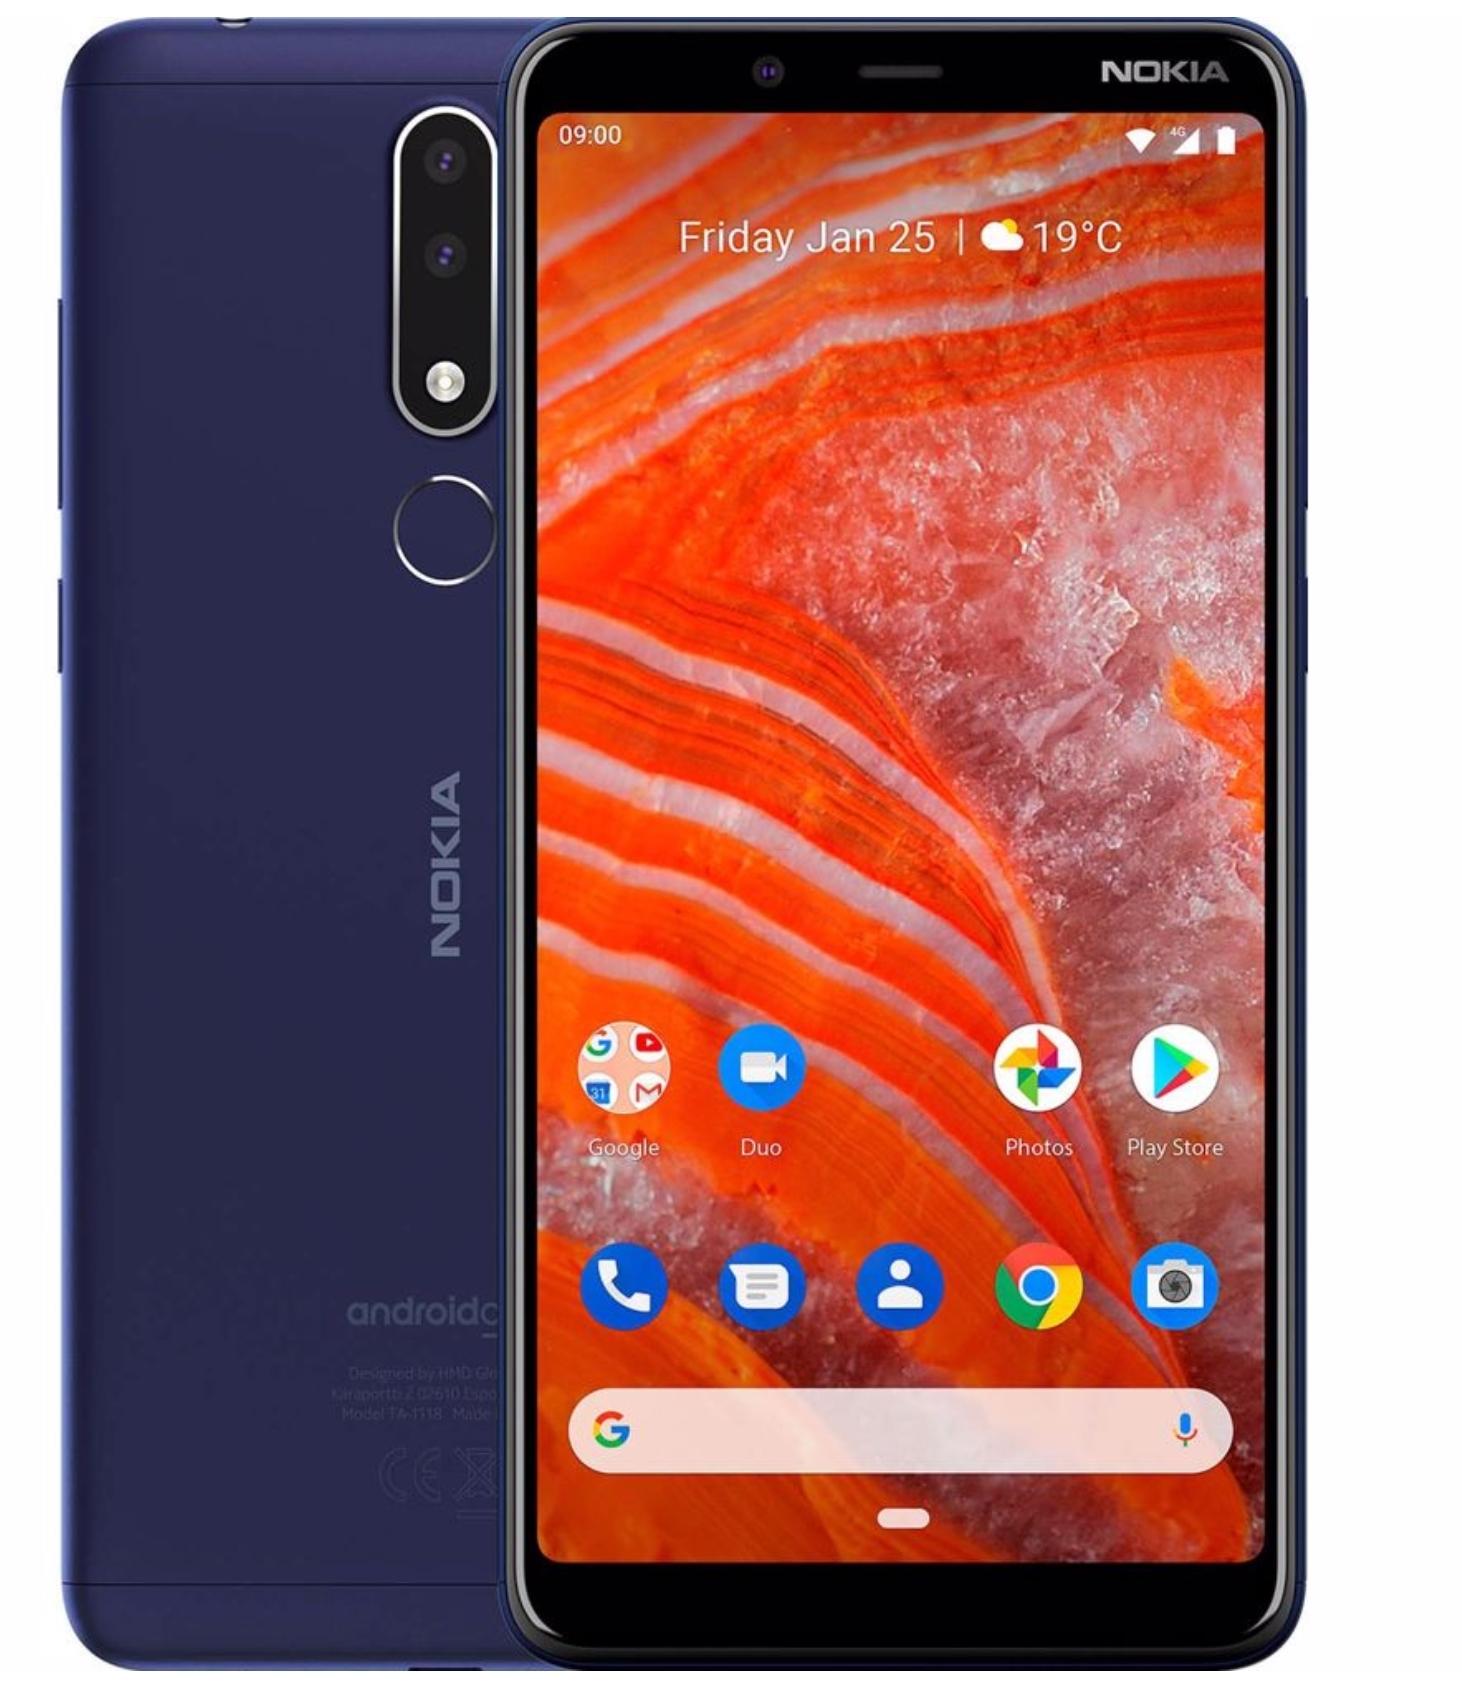 Nokia 3.1 Plus - 32 GB Dual-sim Blauw @ Mobiel.nl